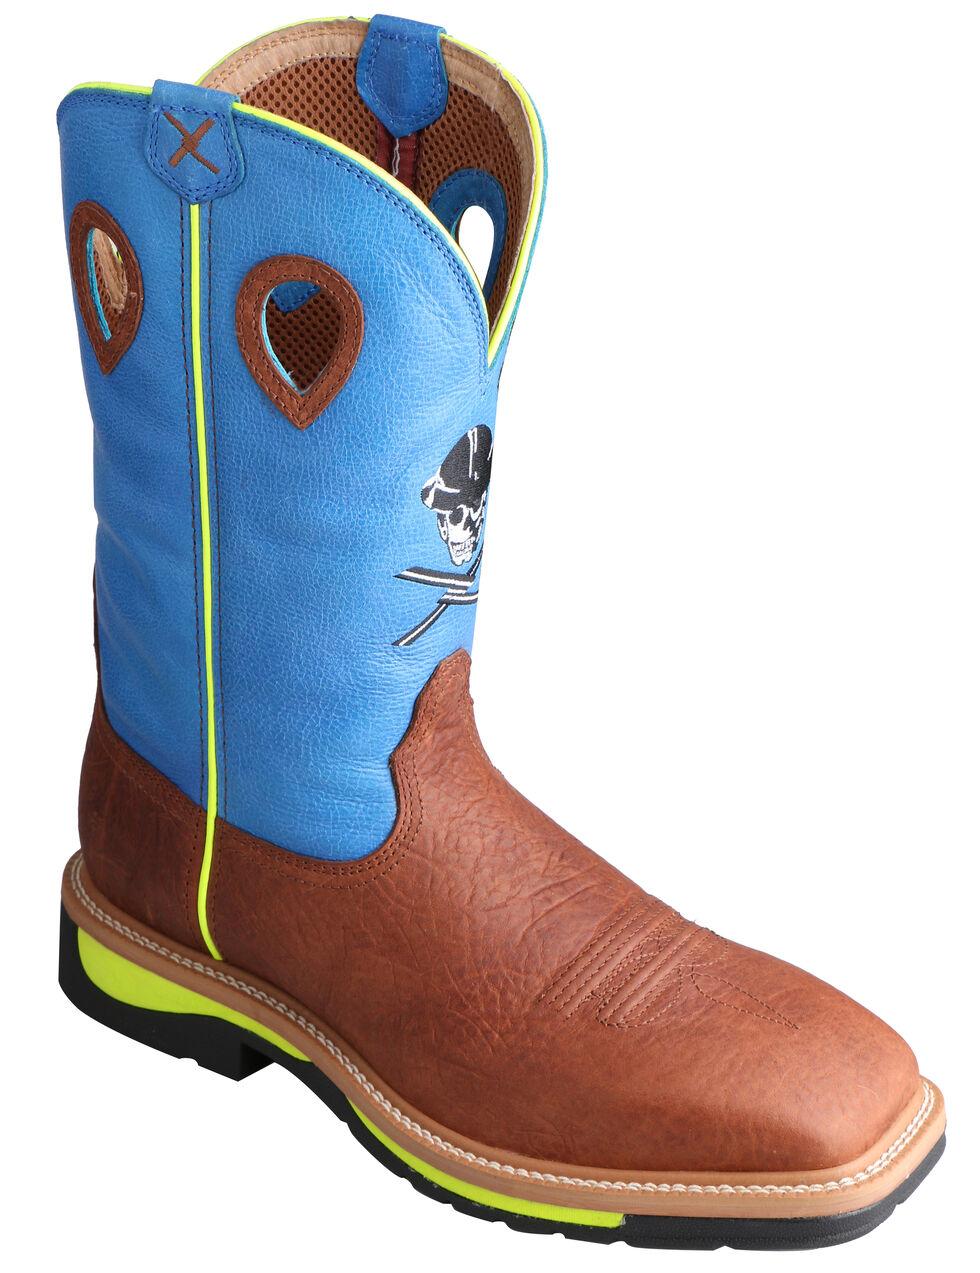 Twisted X Men's Neon Blue Lite Cowboy Work Boots - Steel Toe , Brown, hi-res